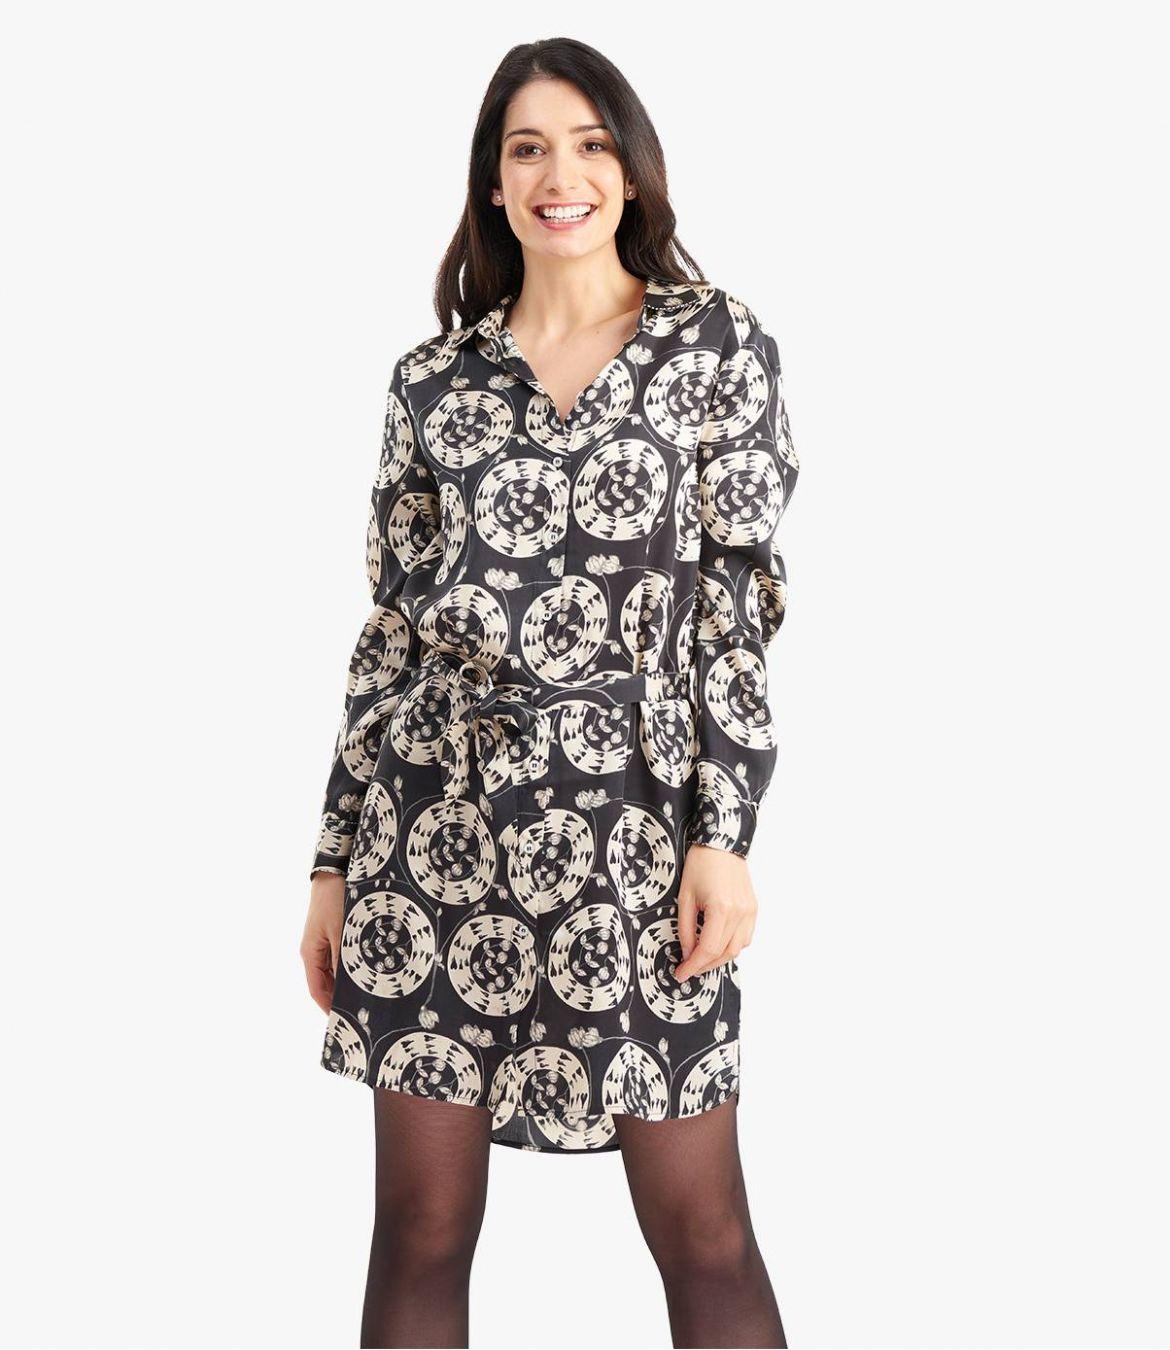 KAIA EVE Robe en Modal satin pour Femme - 2